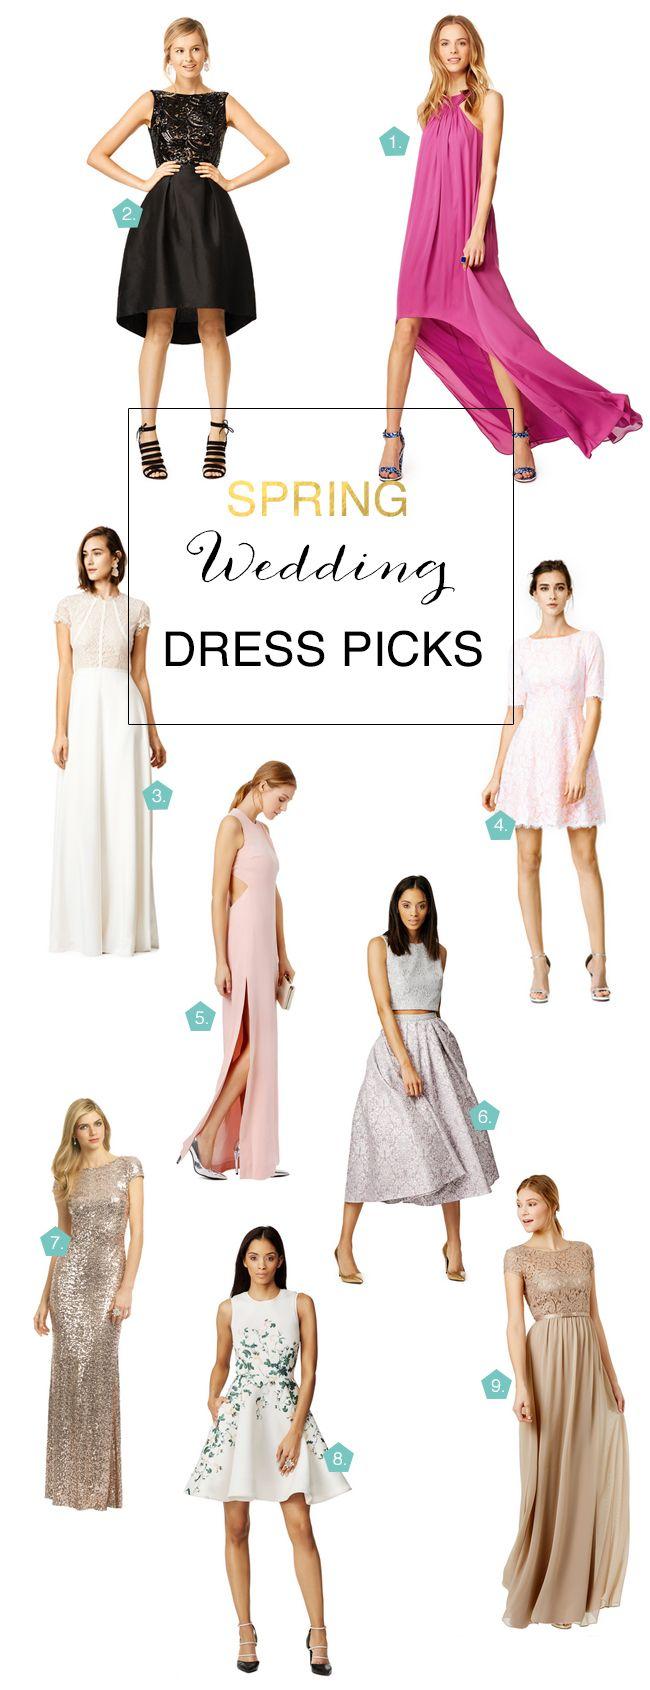 Spring Wedding Dress Picks For Guests